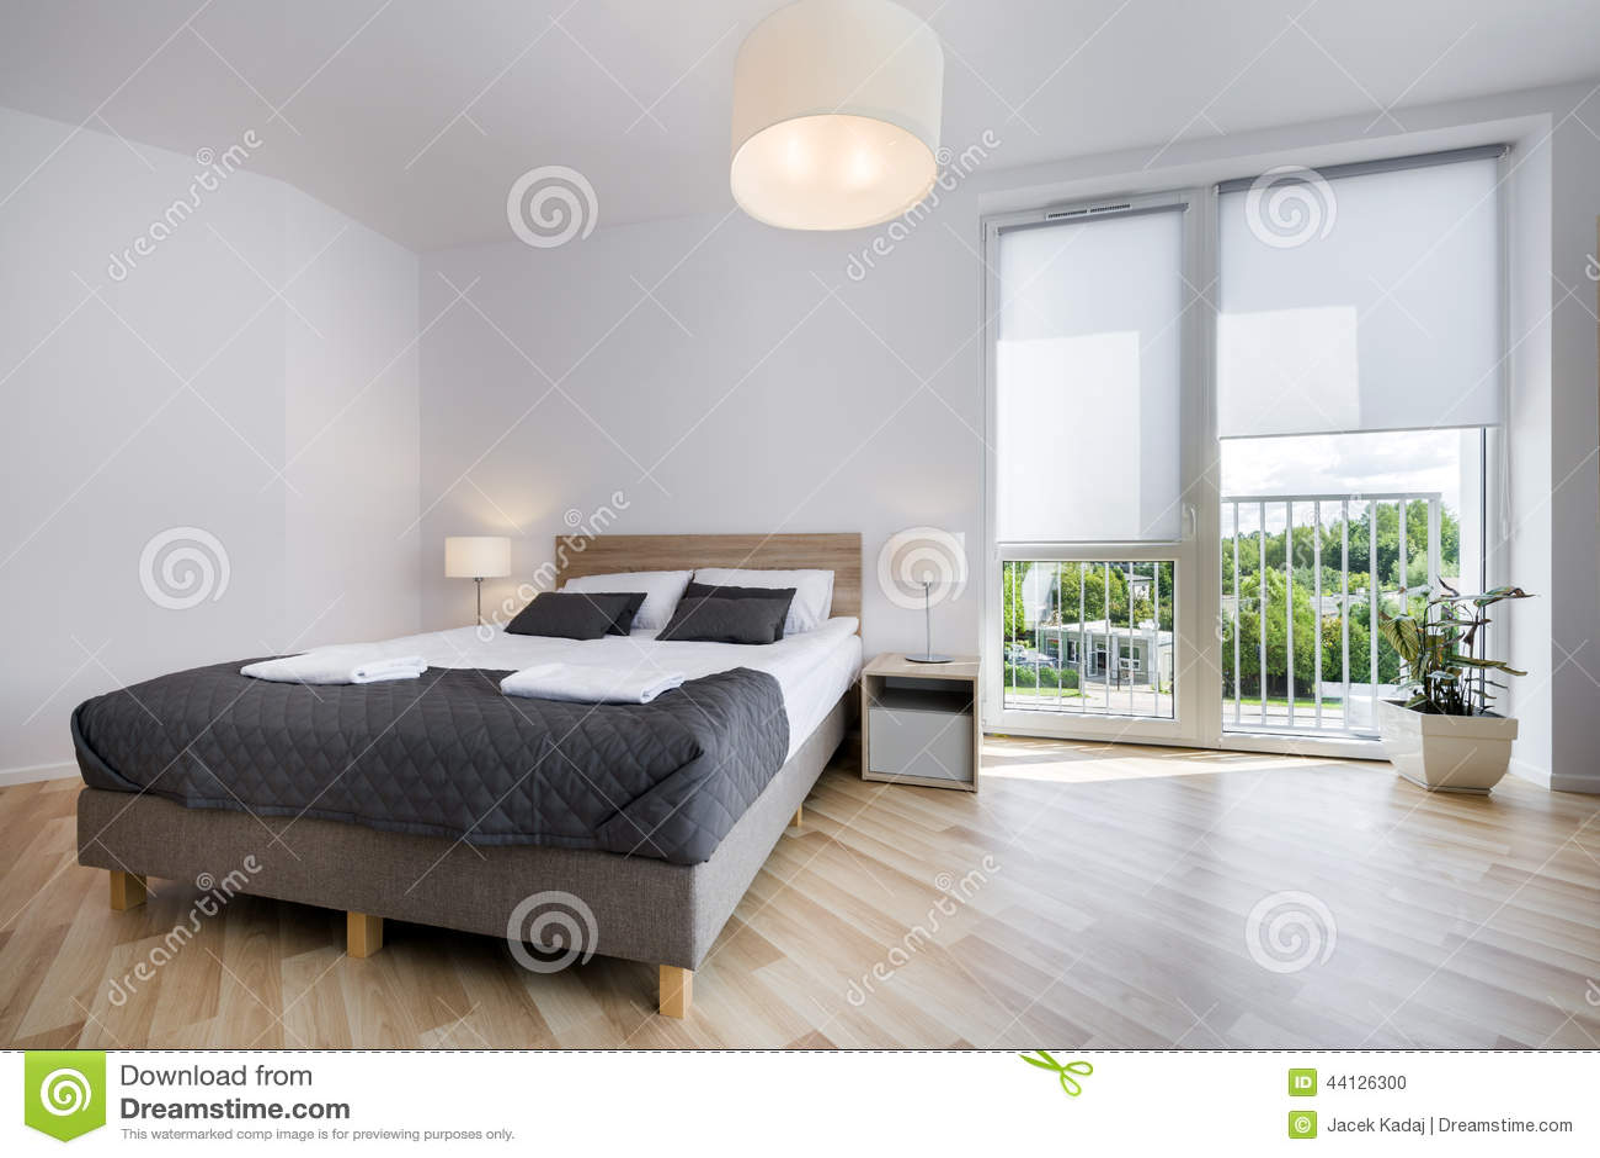 Bright And Comfortable Bedroom Interior Design Stock Photo ... on Comfortable Bedroom Ideas  id=79539